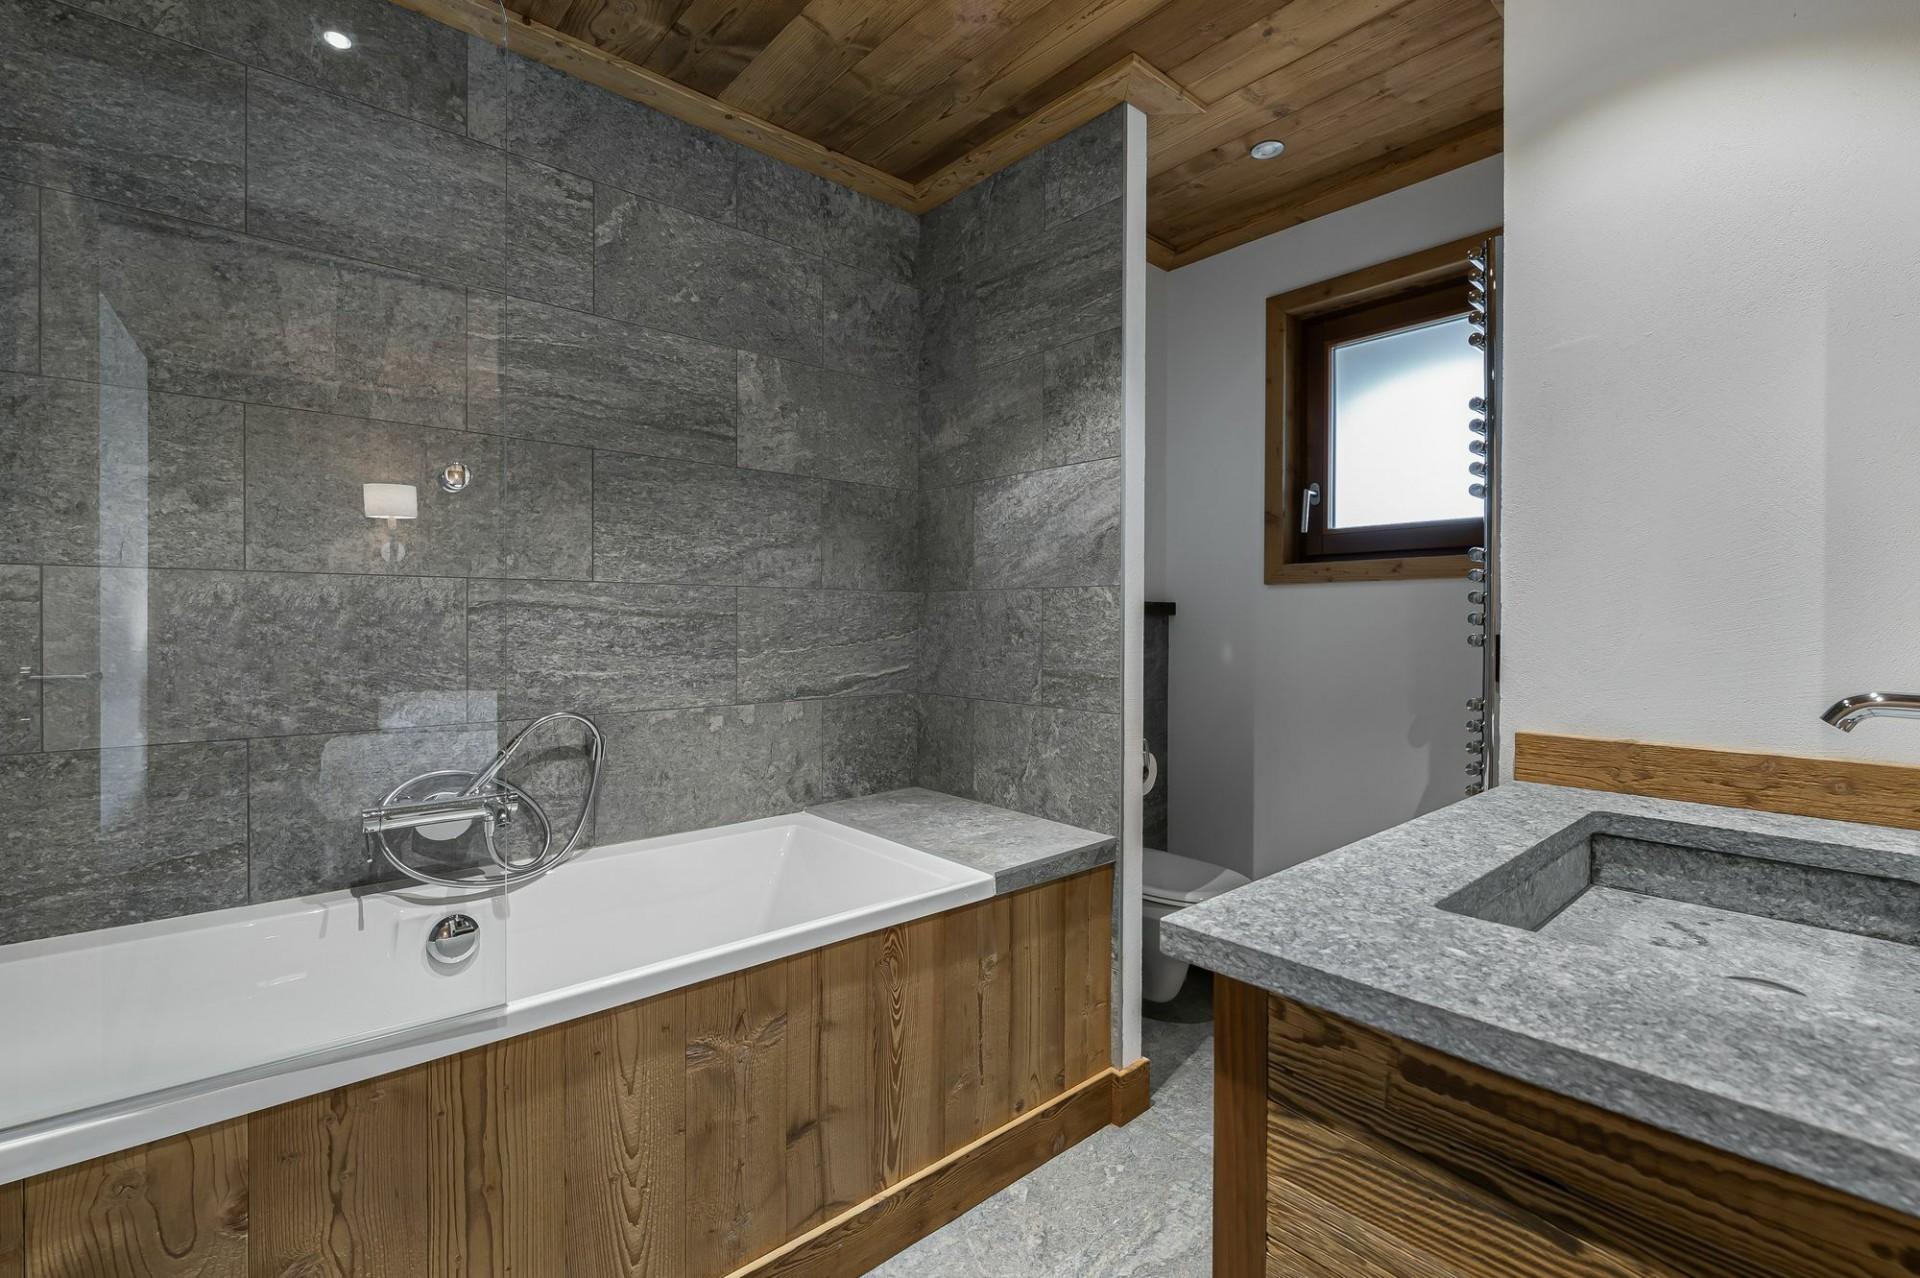 Courchevel 1300 Location Appartement Luxe Tilante Salle De Bain